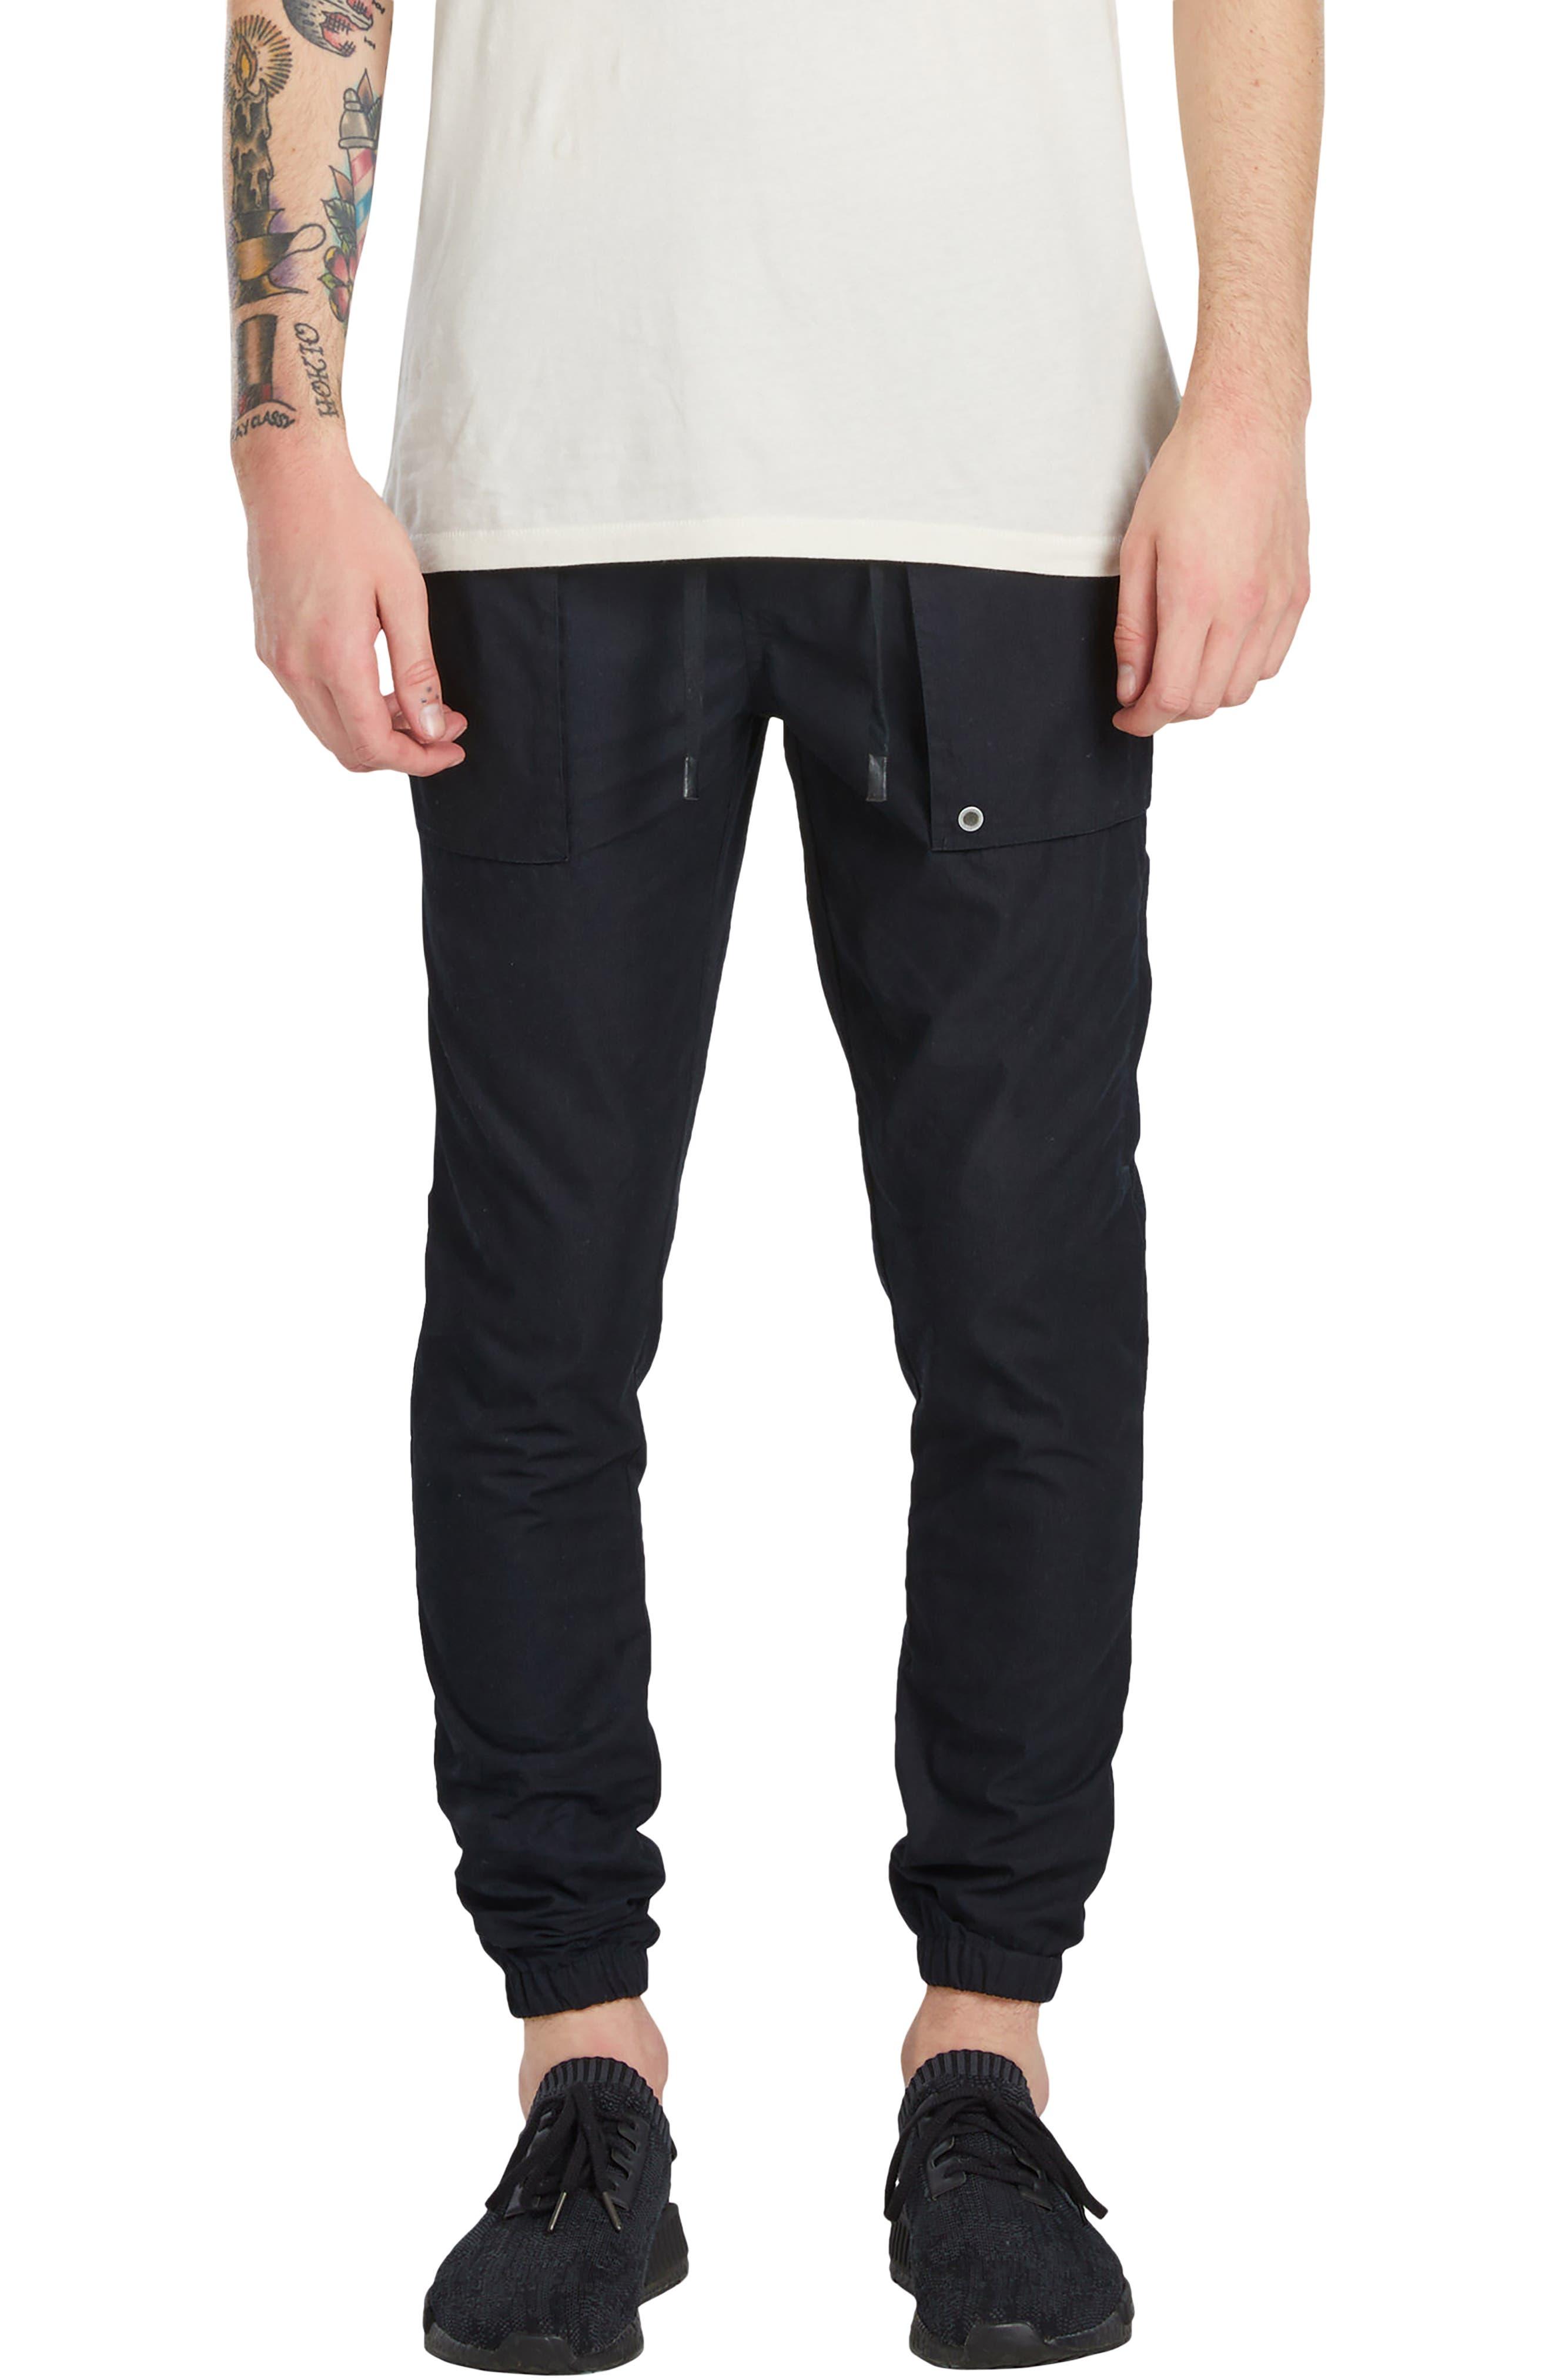 Tracer Cargo Jogger Pants,                         Main,                         color, Black